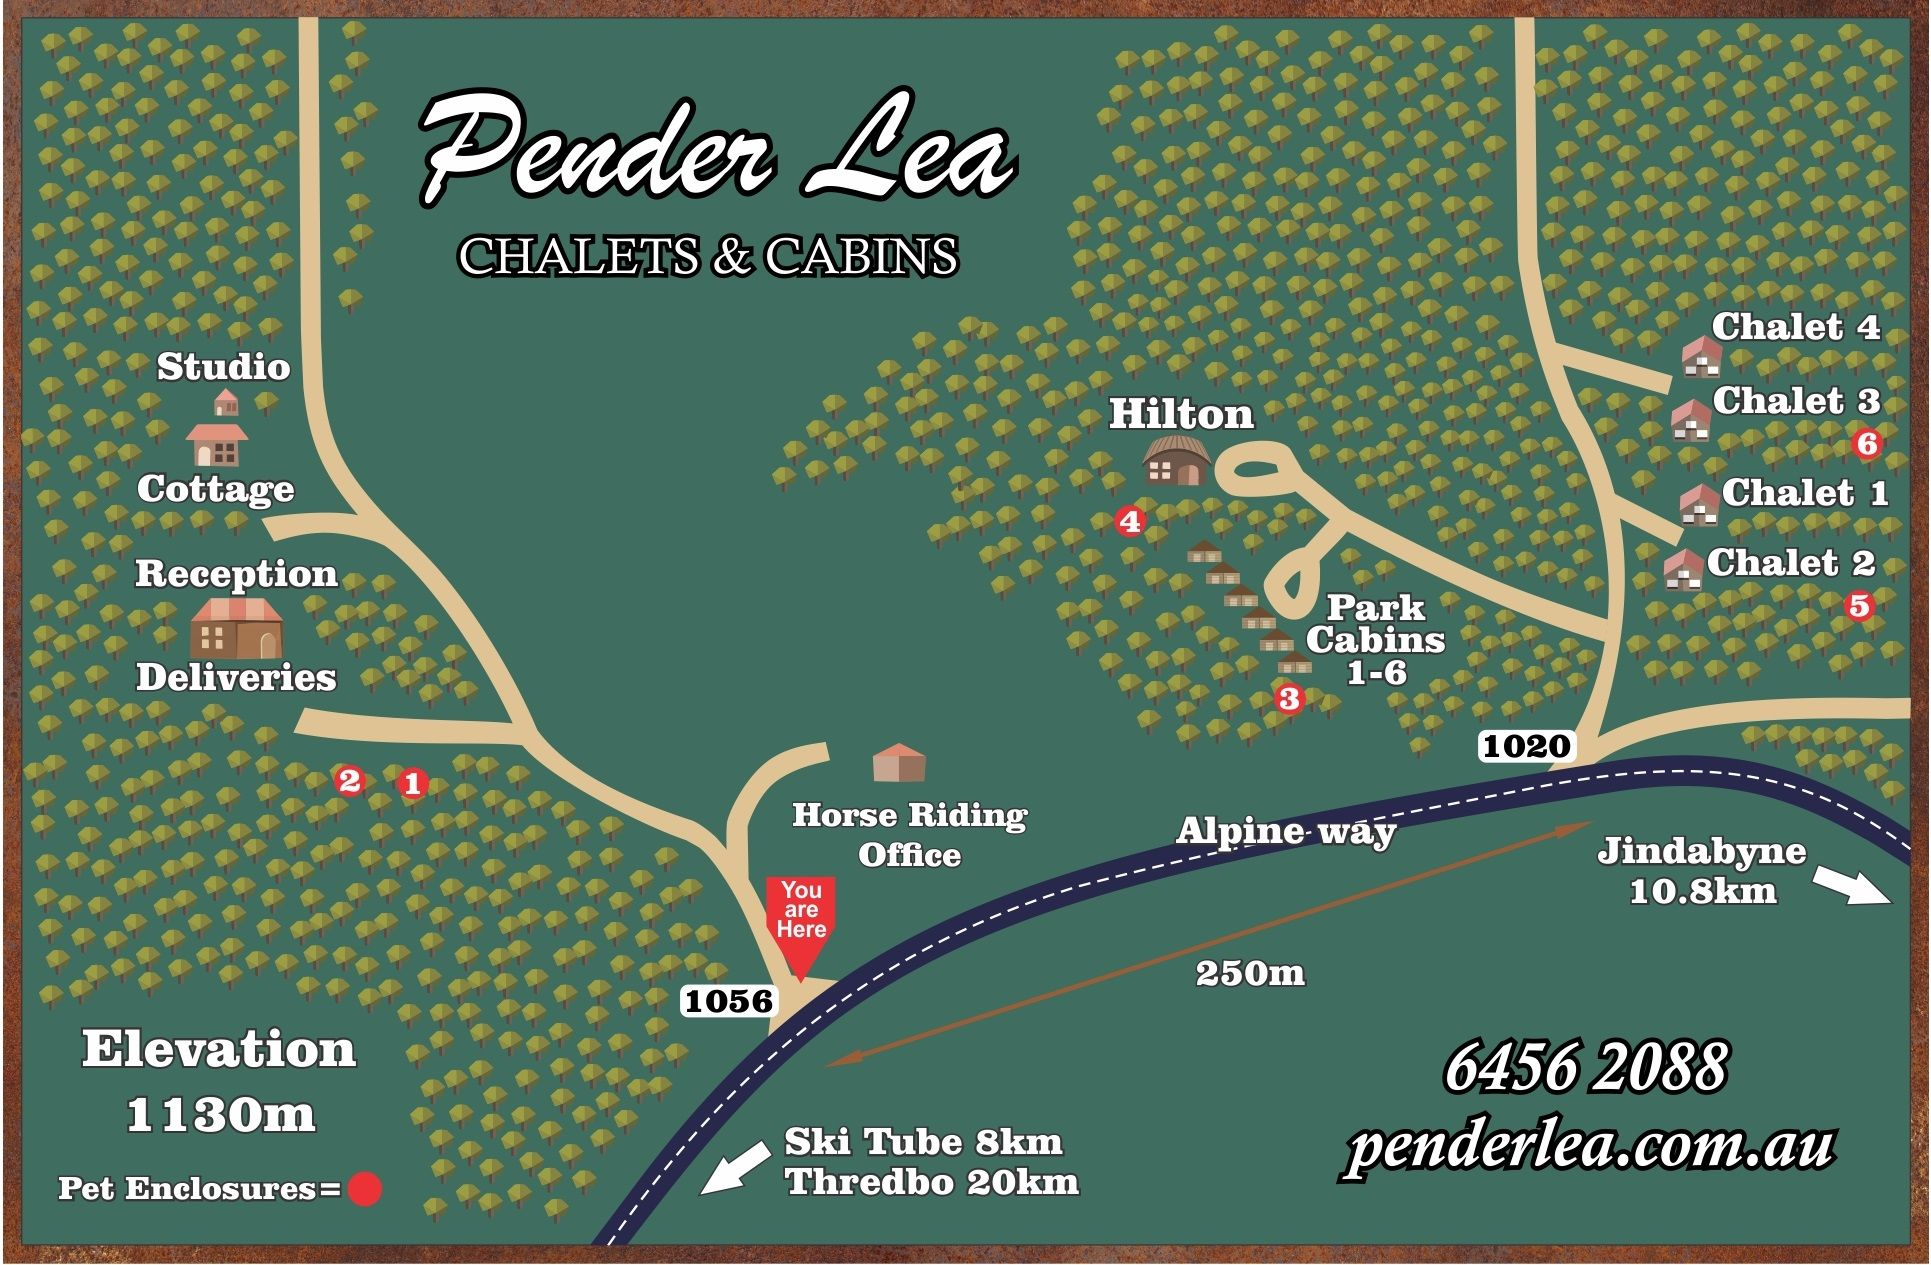 Pender Lea Map